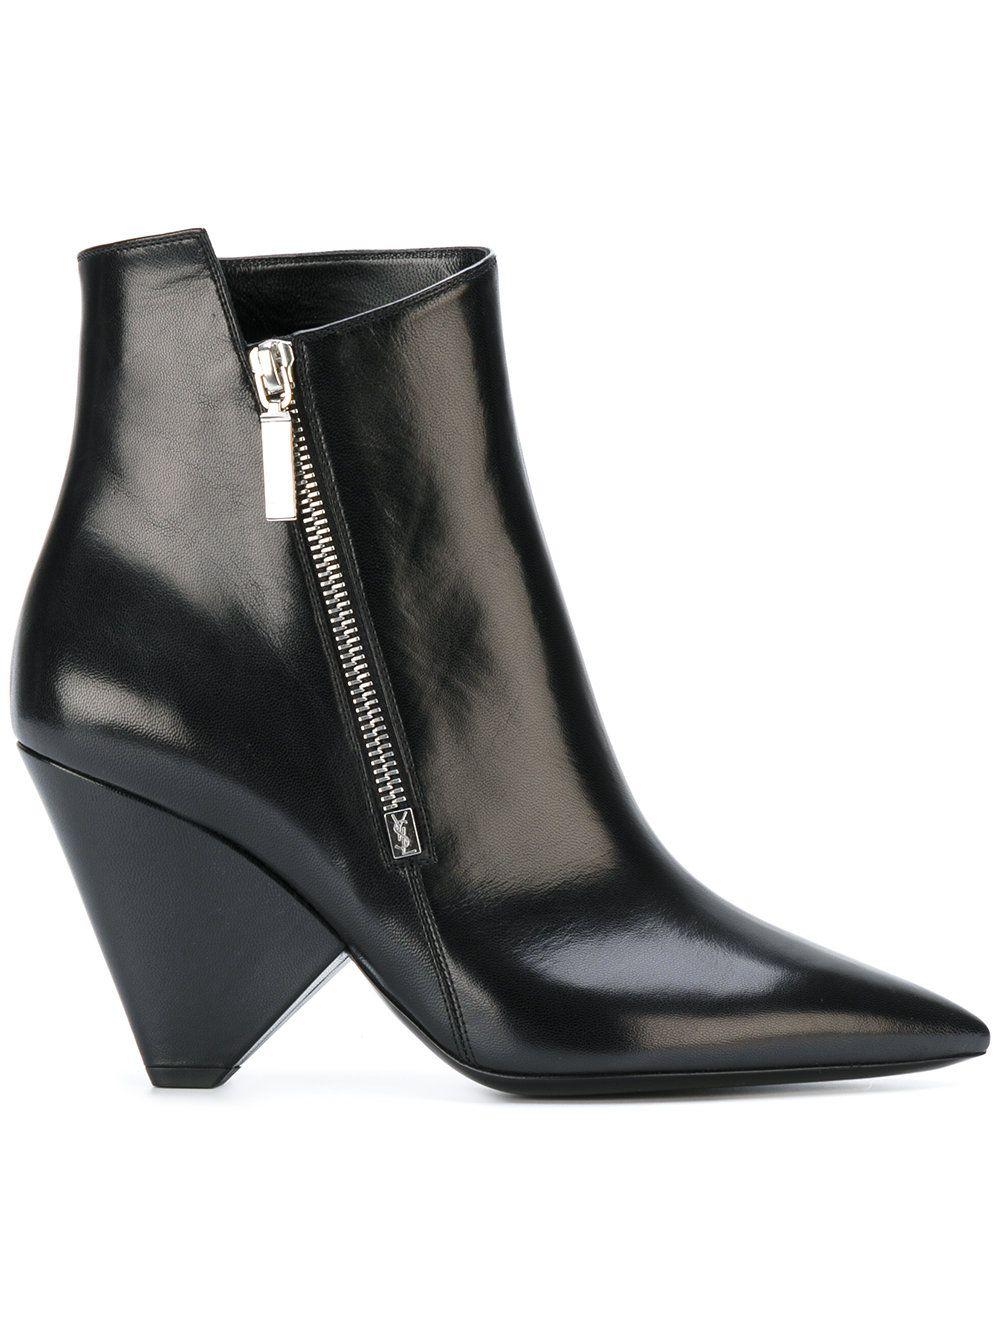 7bc62cb5d000 Saint Laurent Niki 85 asymmetrical boots